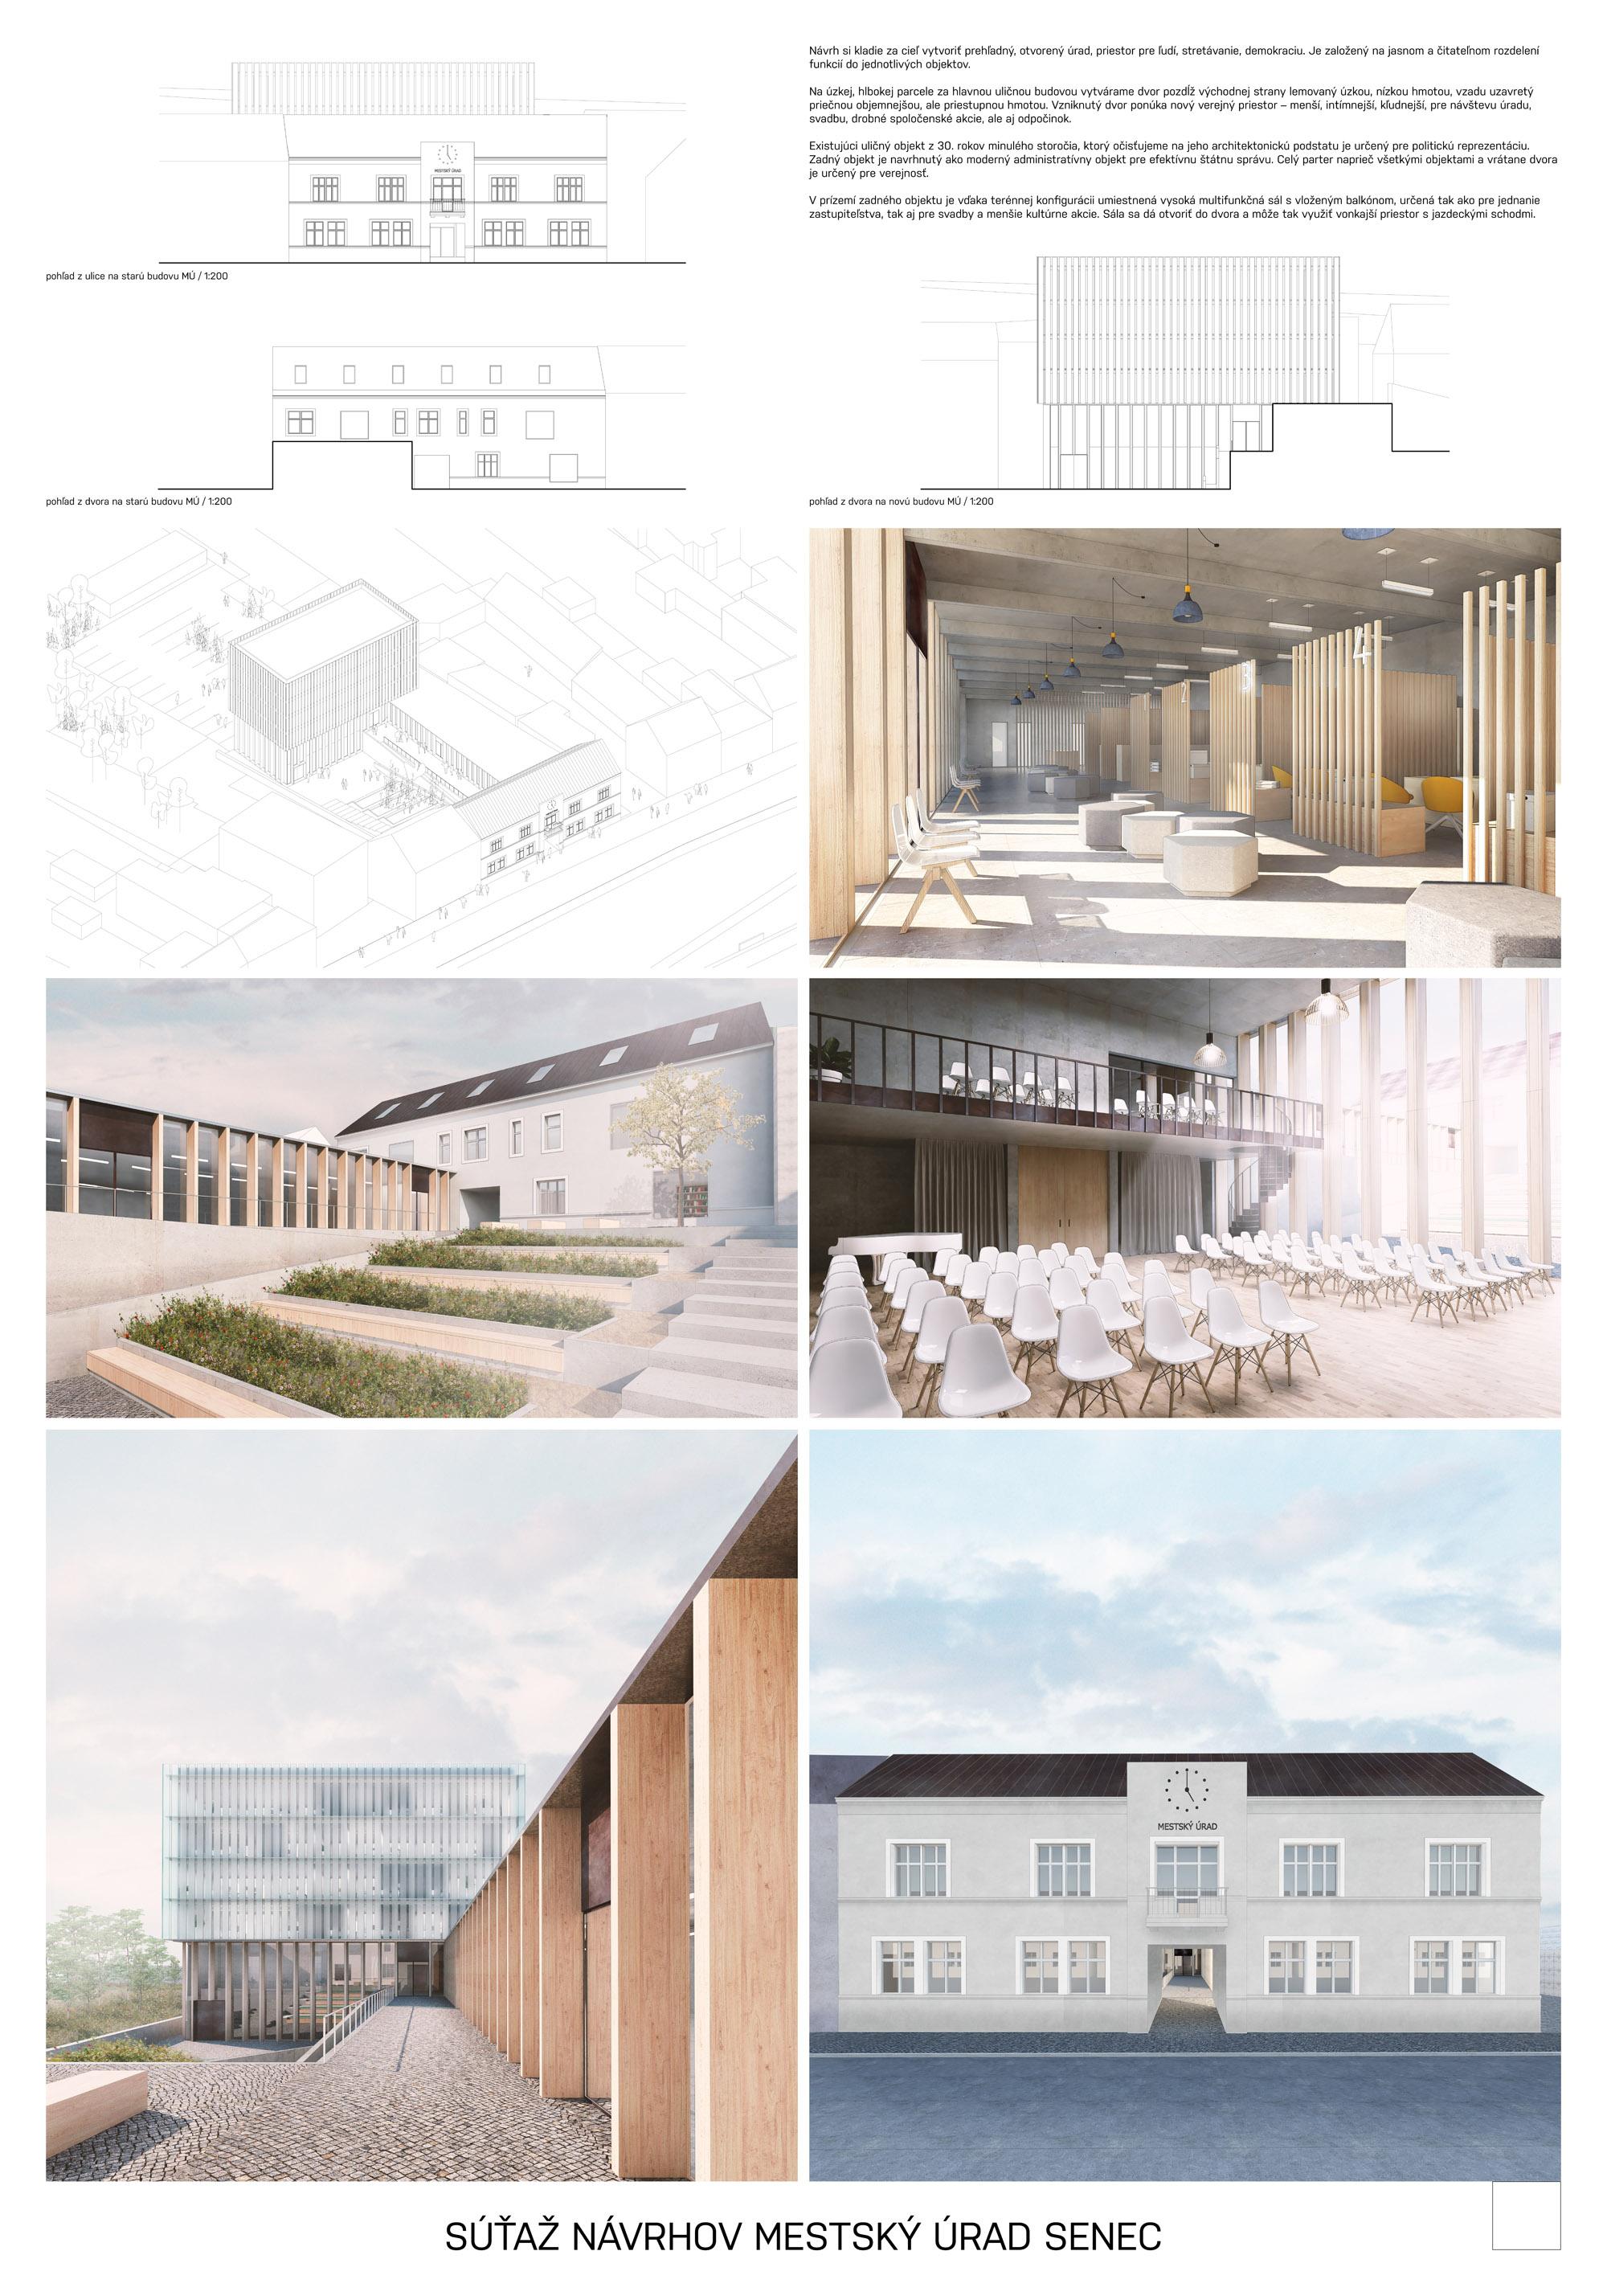 Veľká vysoká škola kohúty interracial cuckold rúrky